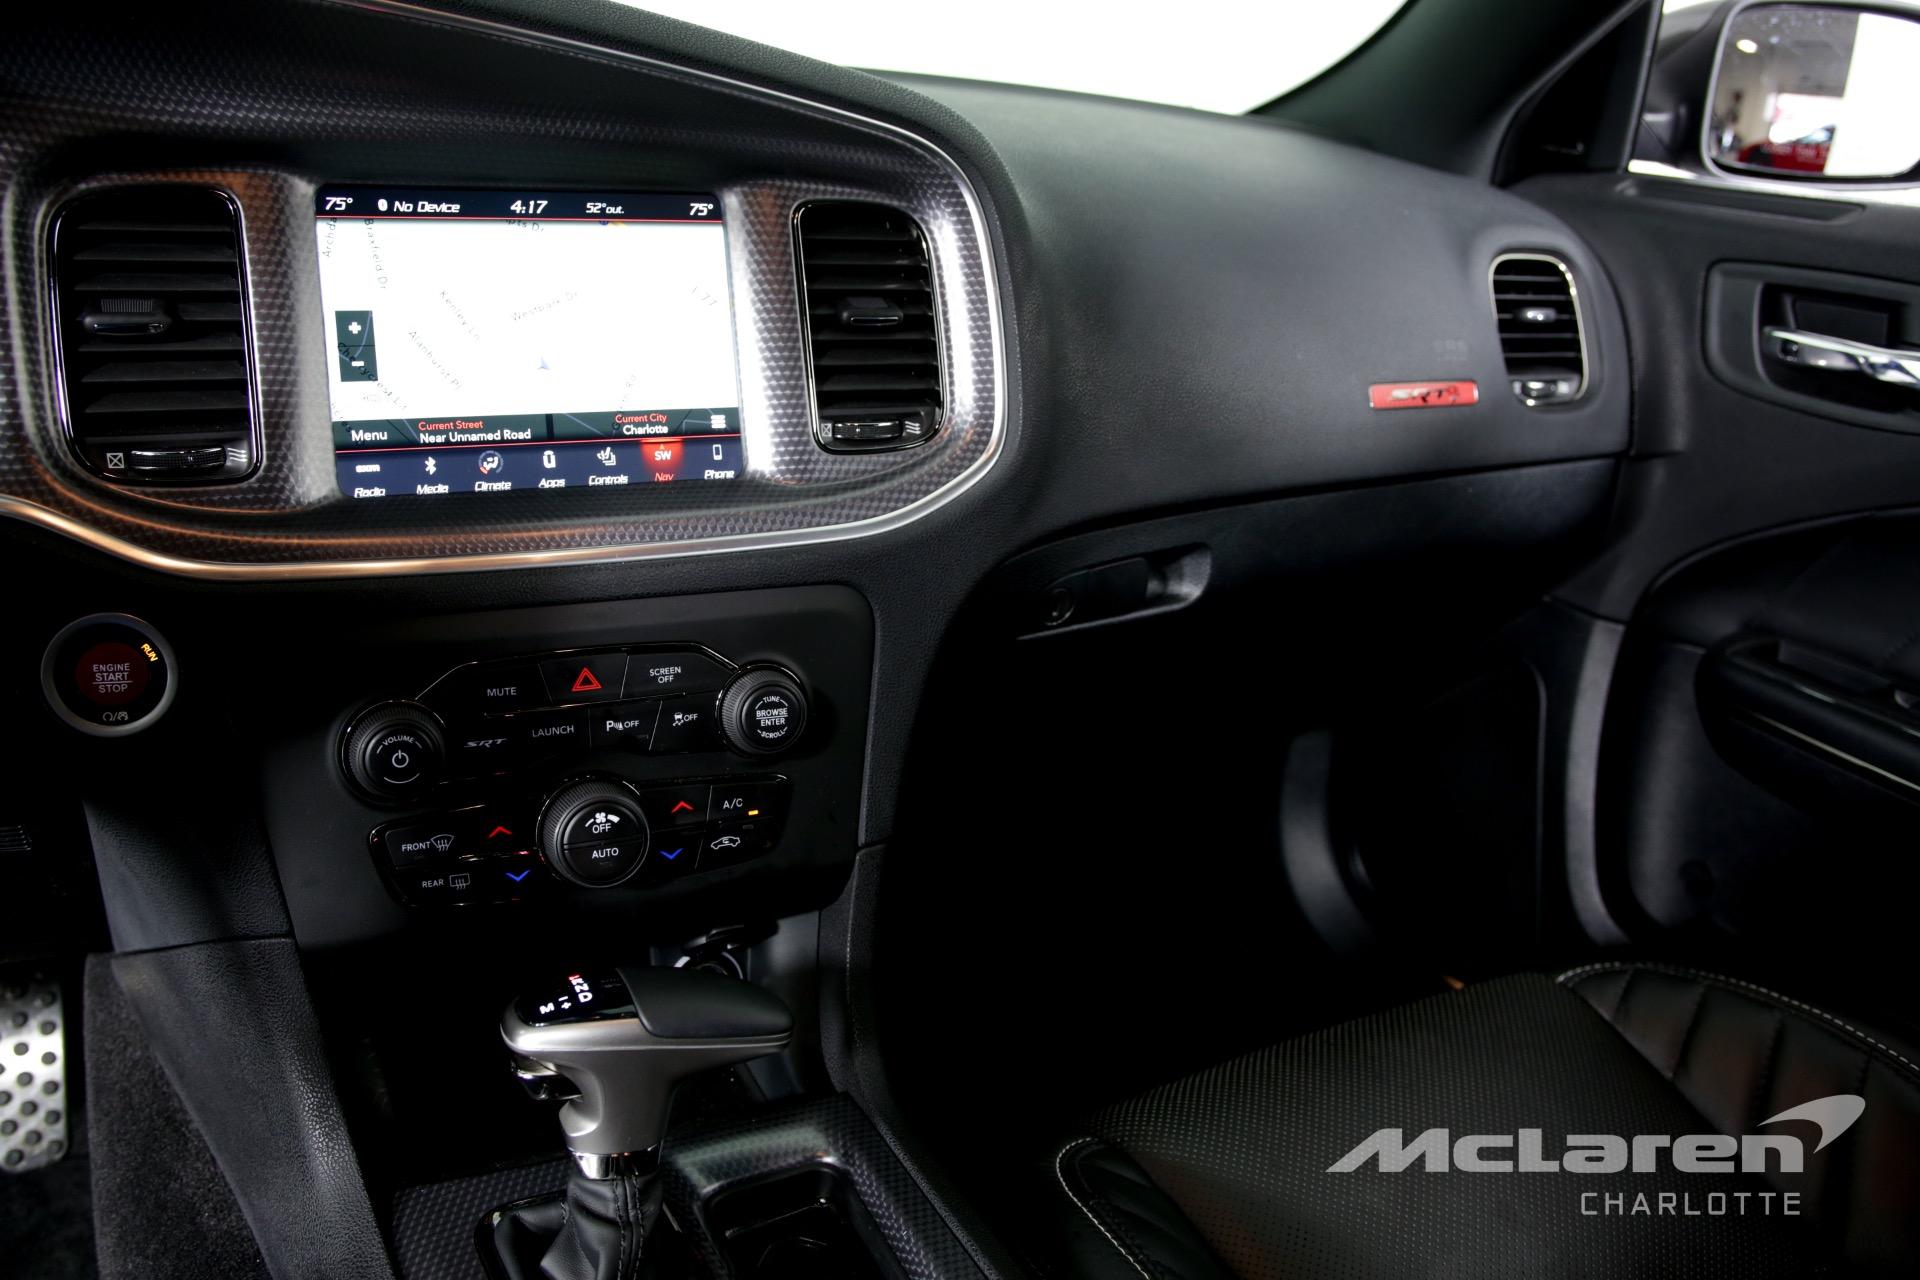 Used 2018 Dodge Charger SRT Hellcat | Charlotte, NC